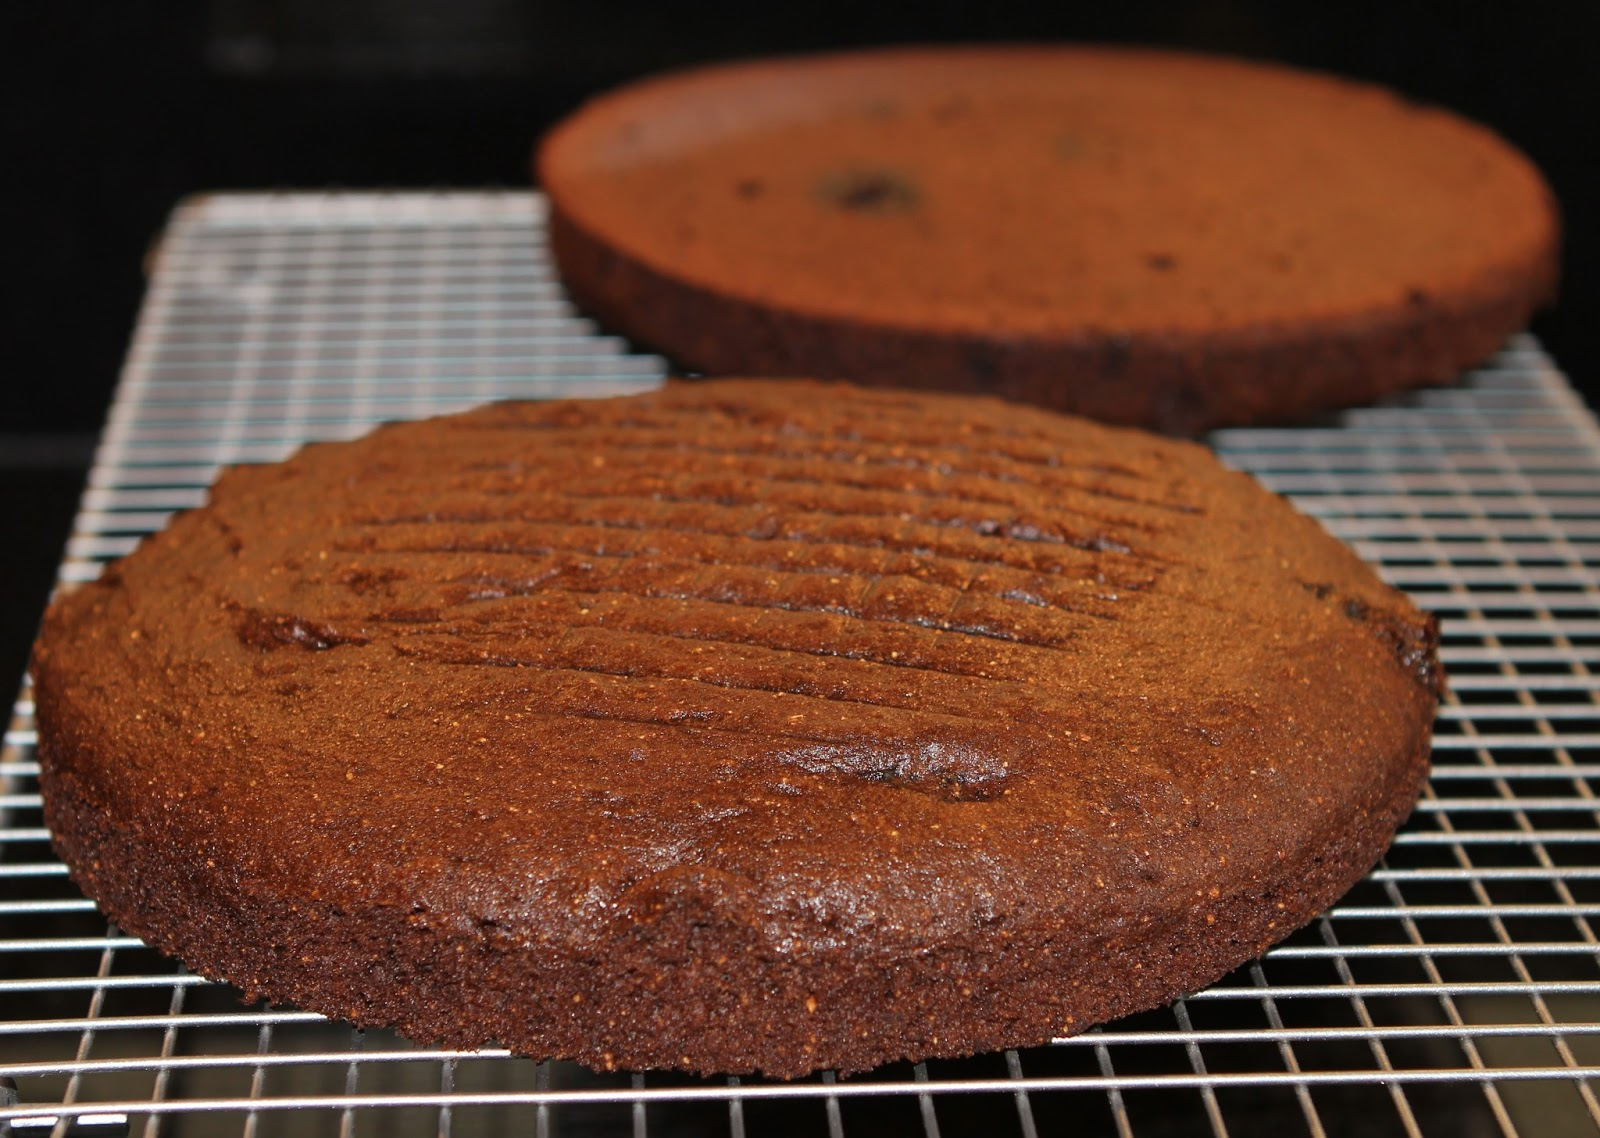 Does Sponge Cake Go With Prosseco